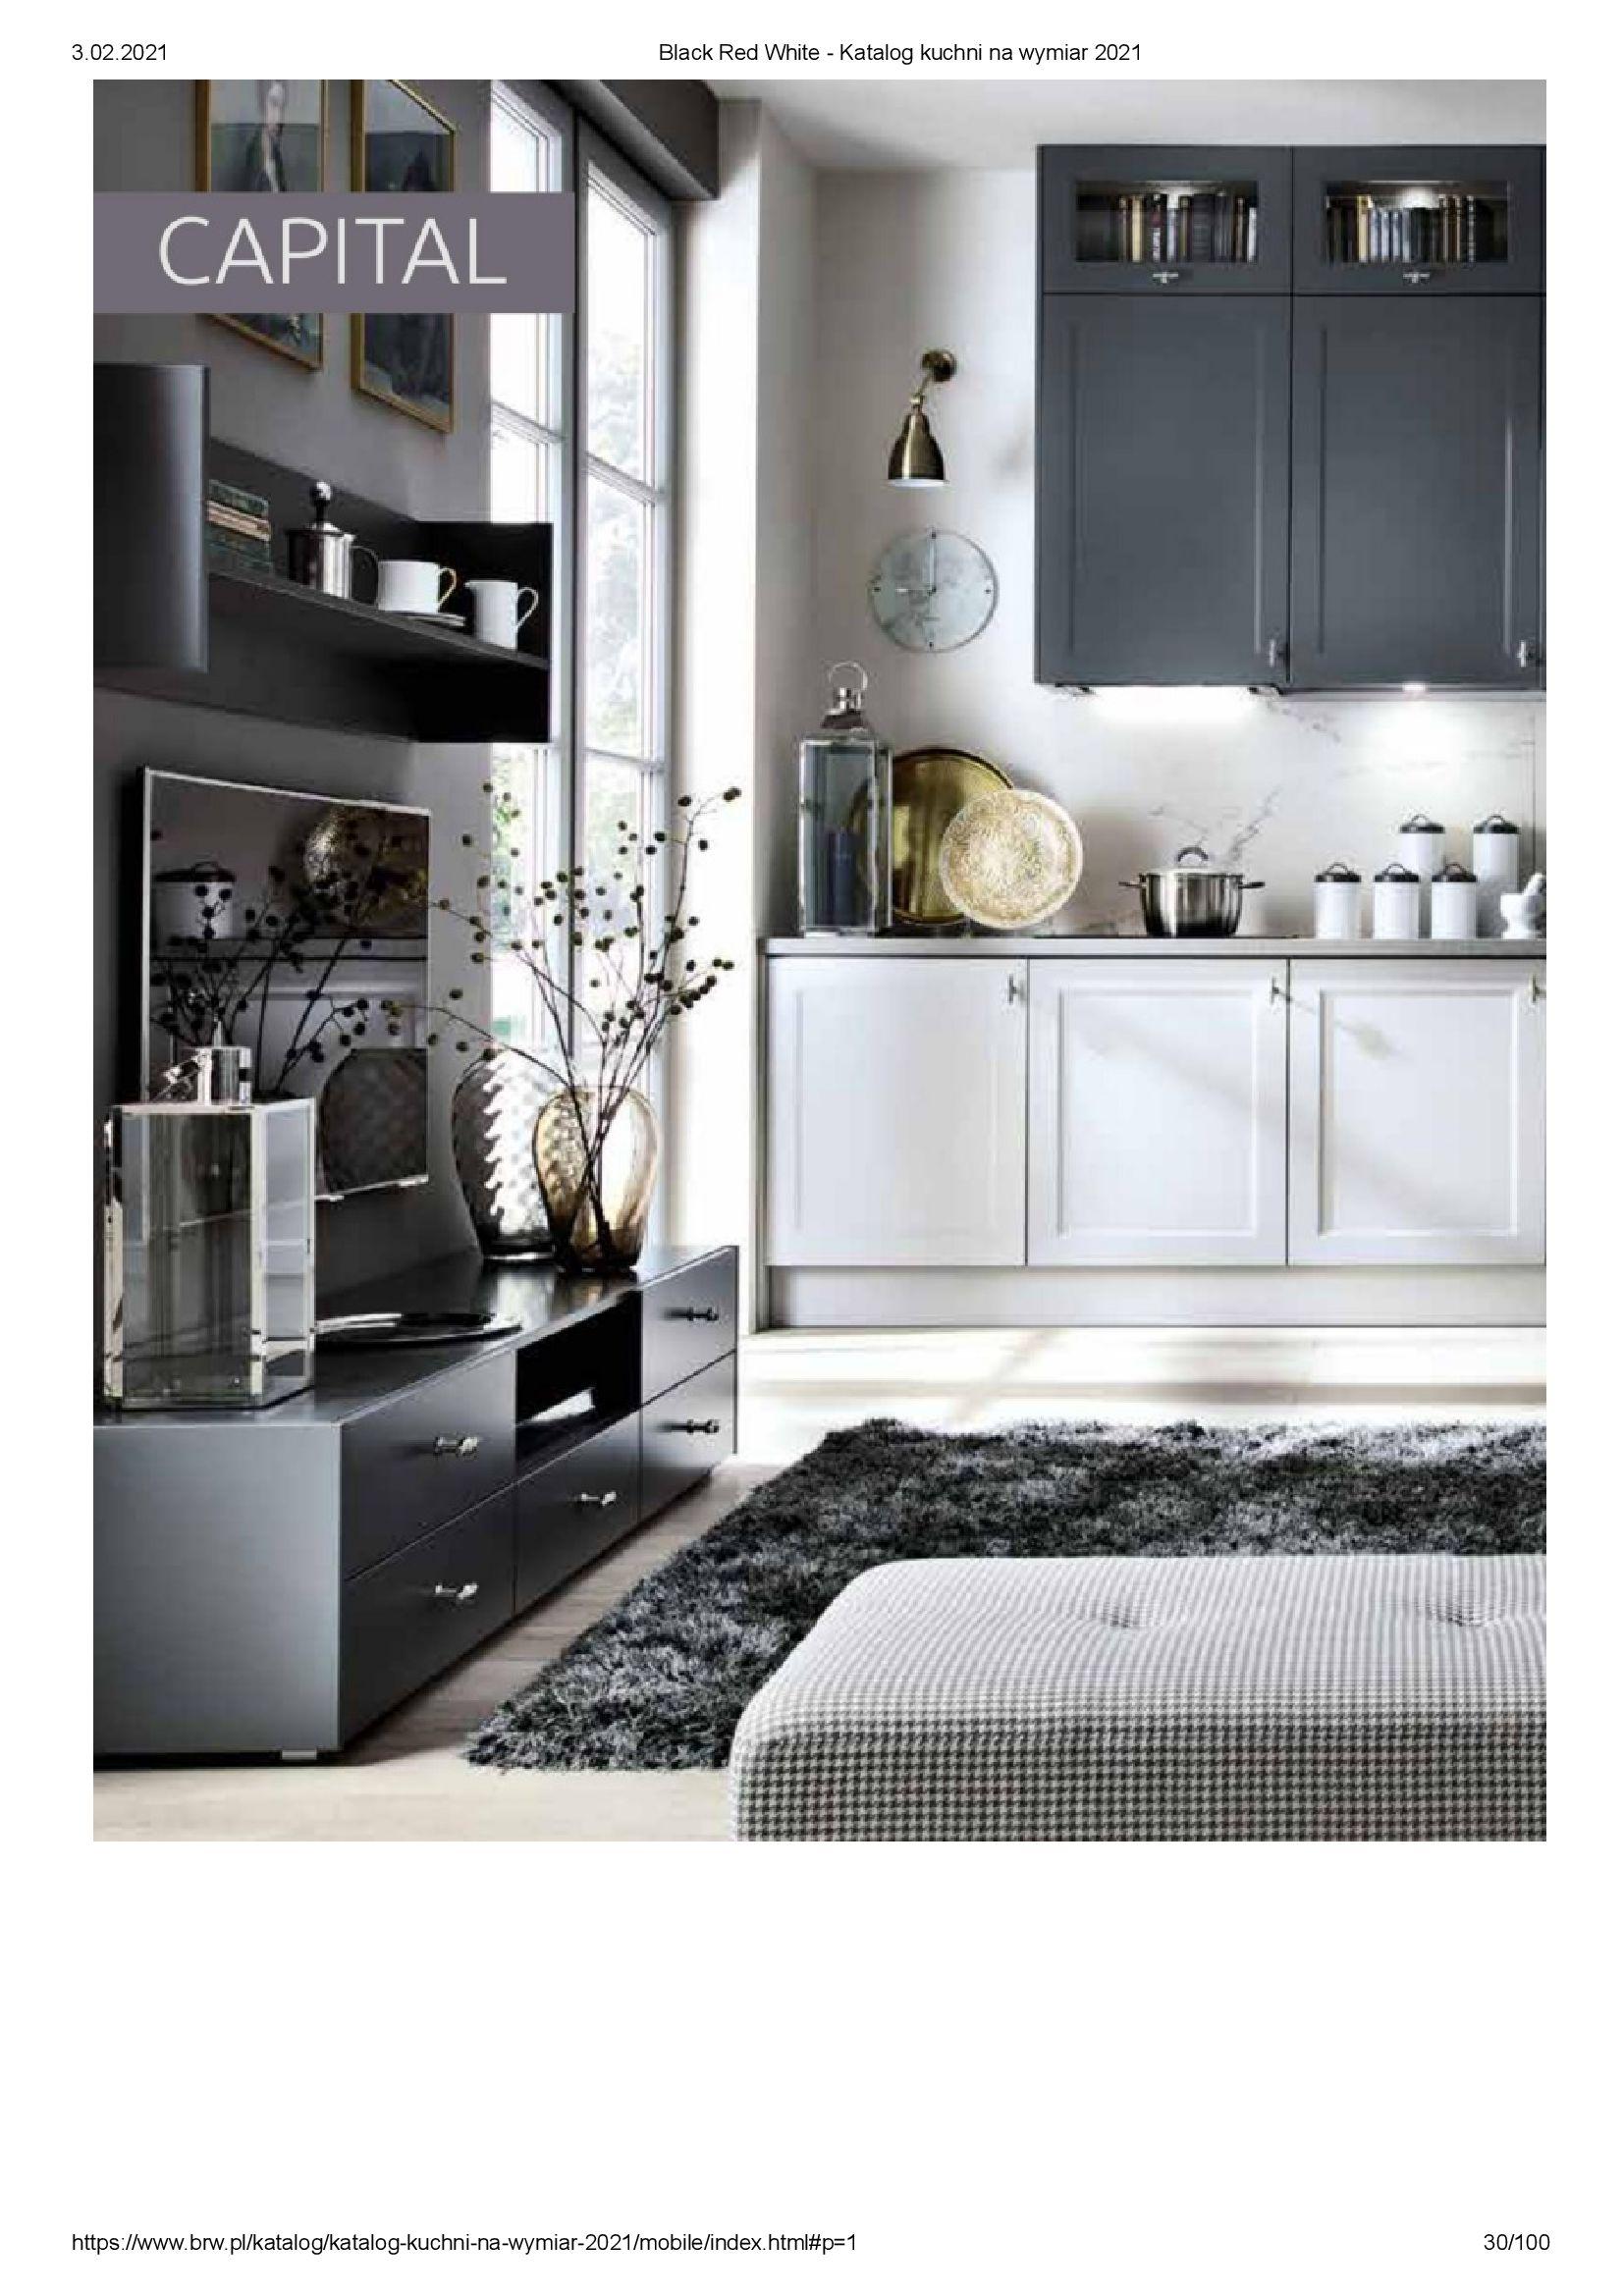 Gazetka Black Red White: Katalog - Kuchnie na wymiar Senso Kitchens 2021 2021-01-01 page-30